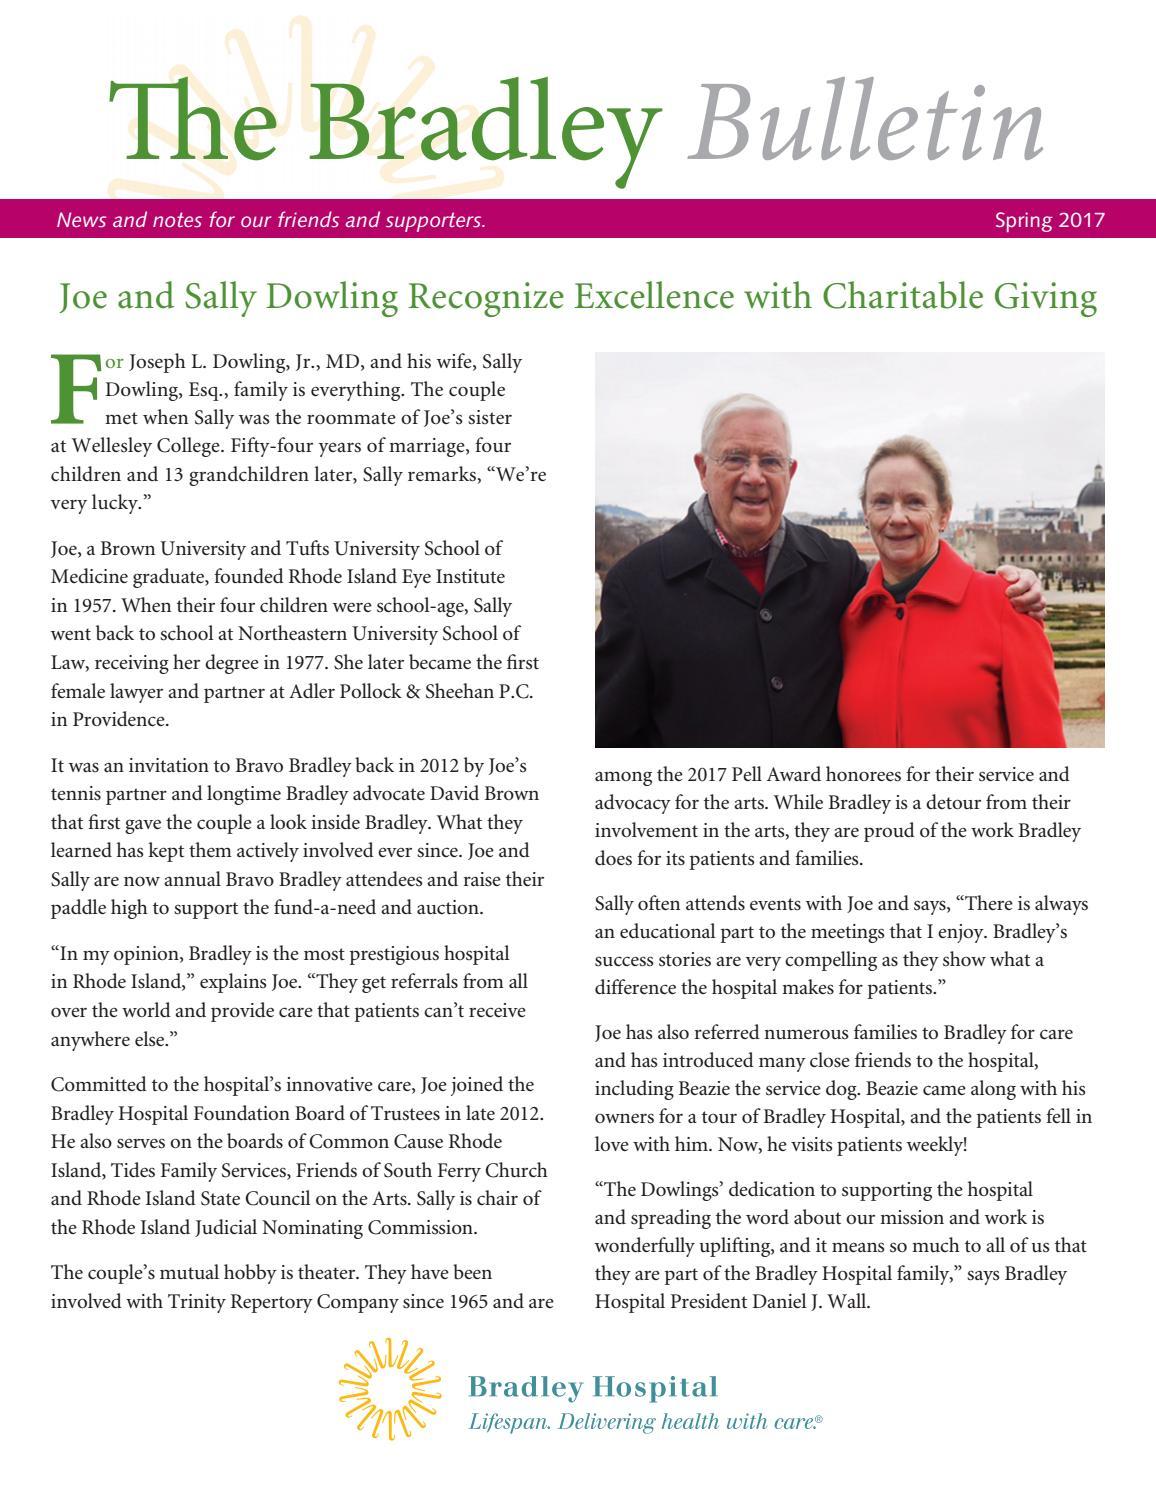 The Bradley Bulletin: Spring 2017 by lifespanmc - issuu